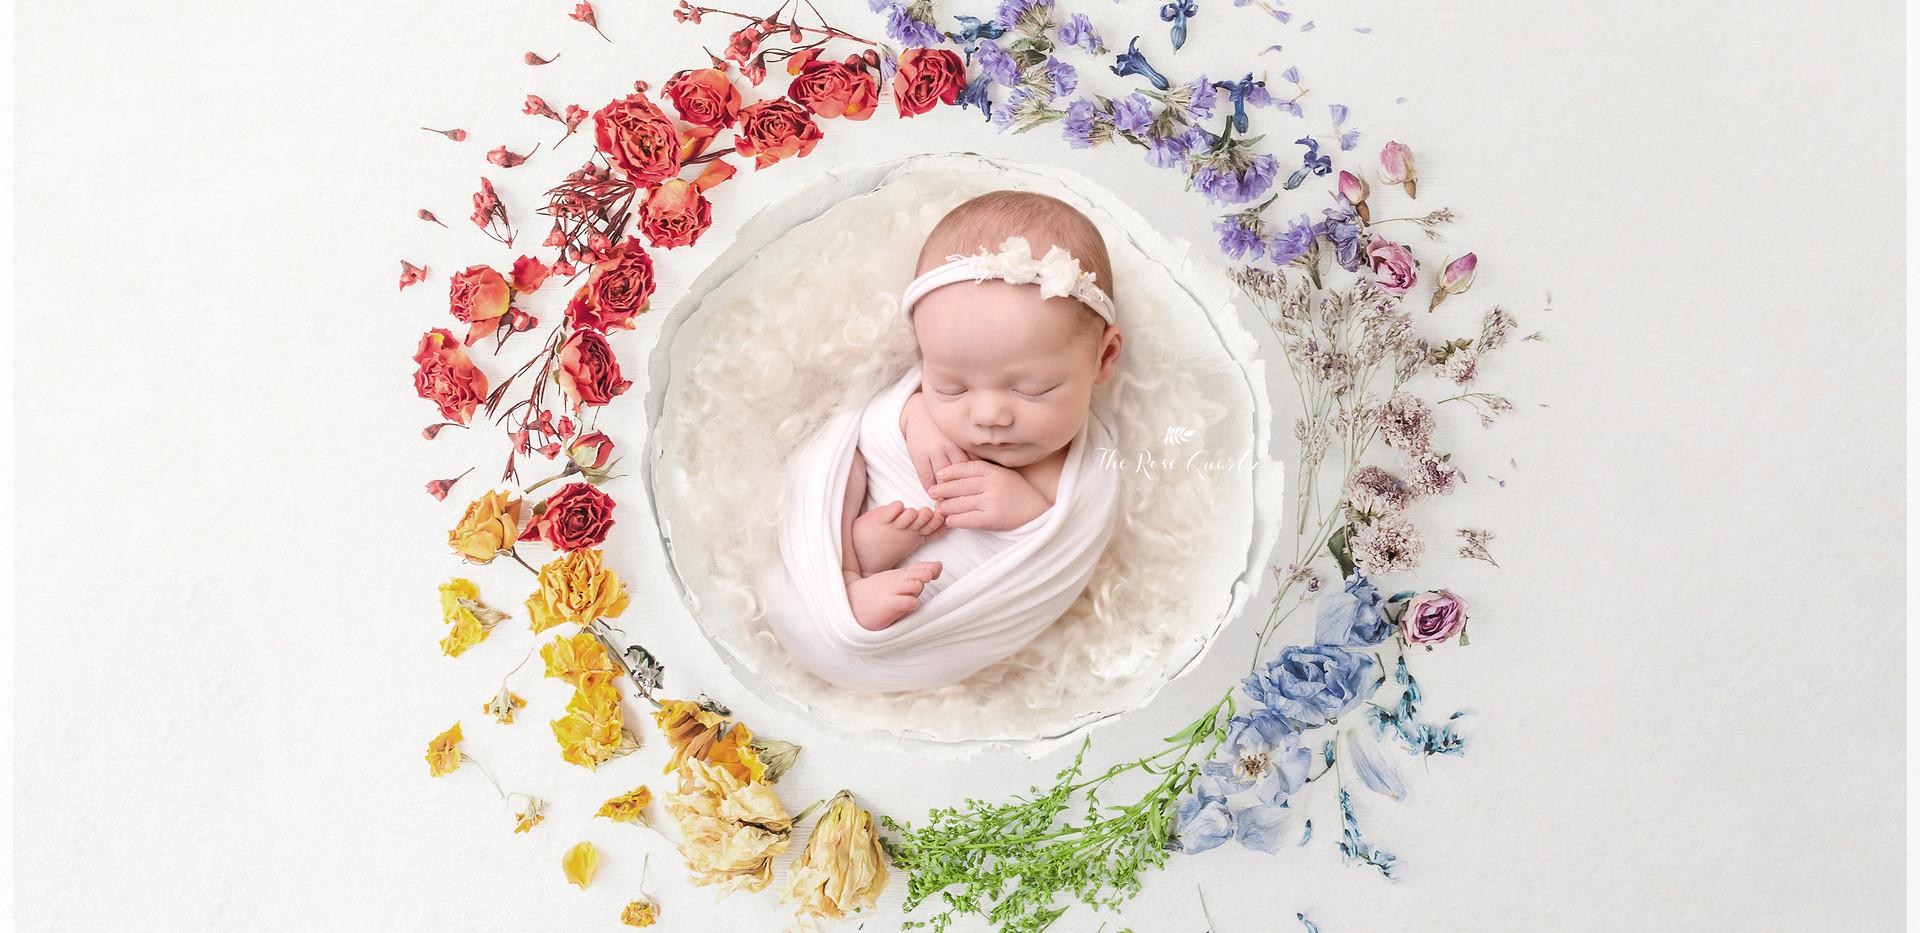 Newborn Baby Photos Photography Hull.jpg